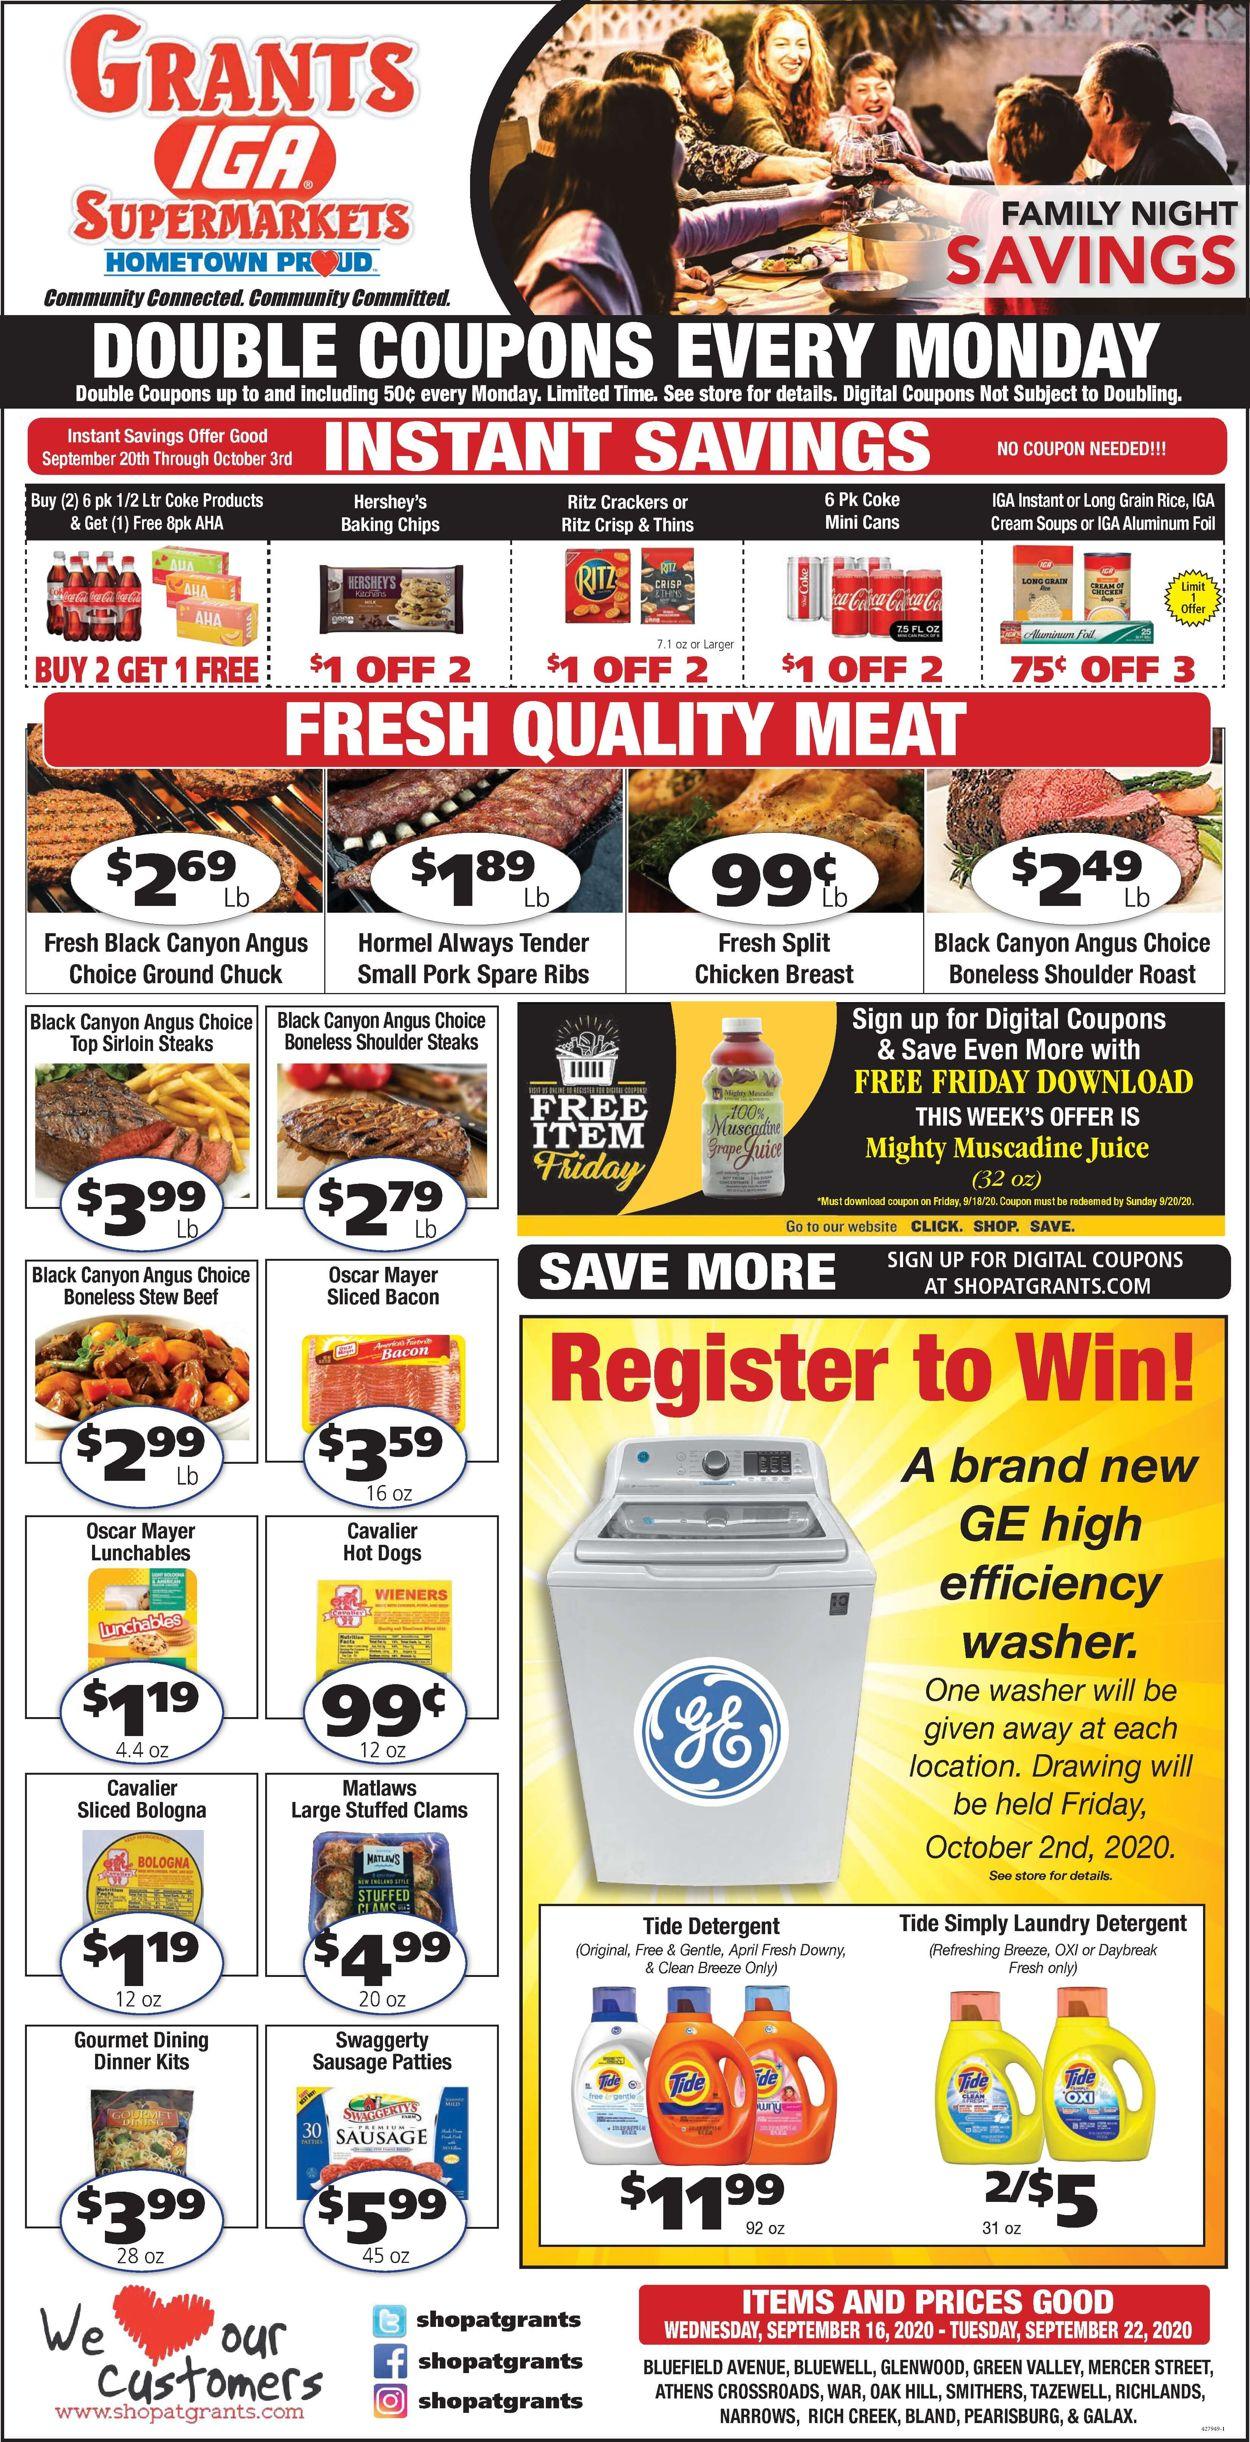 Grant's Supermarket Weekly Ad Circular - valid 09/16-09/22/2020